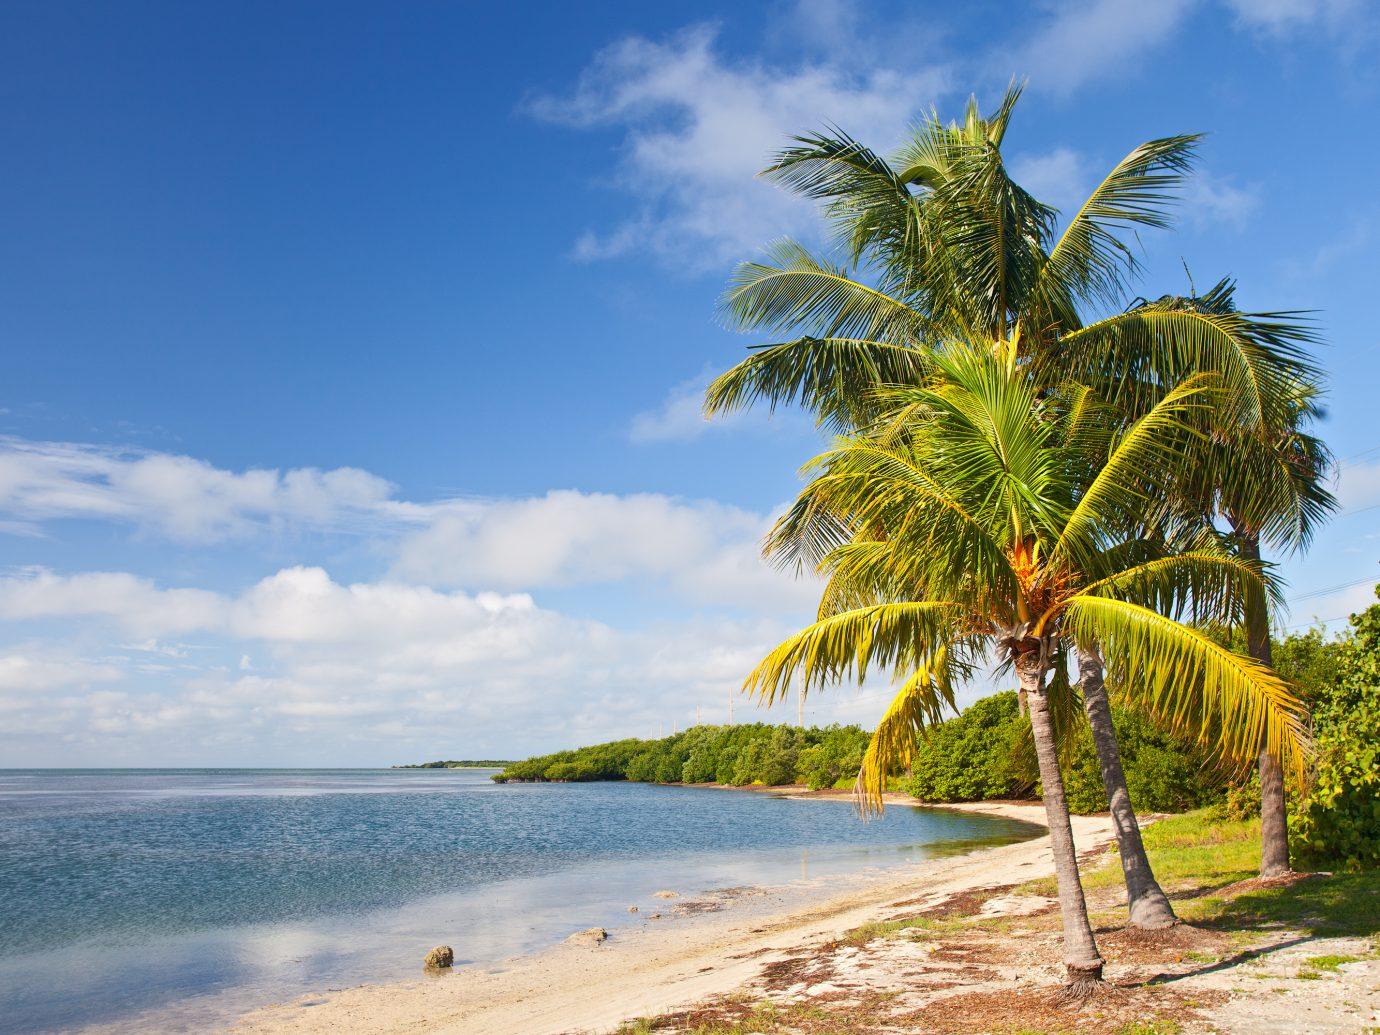 Palm trees, ocean and blue sky on a tropical beach in Florida keys near famous tourist destination Key West